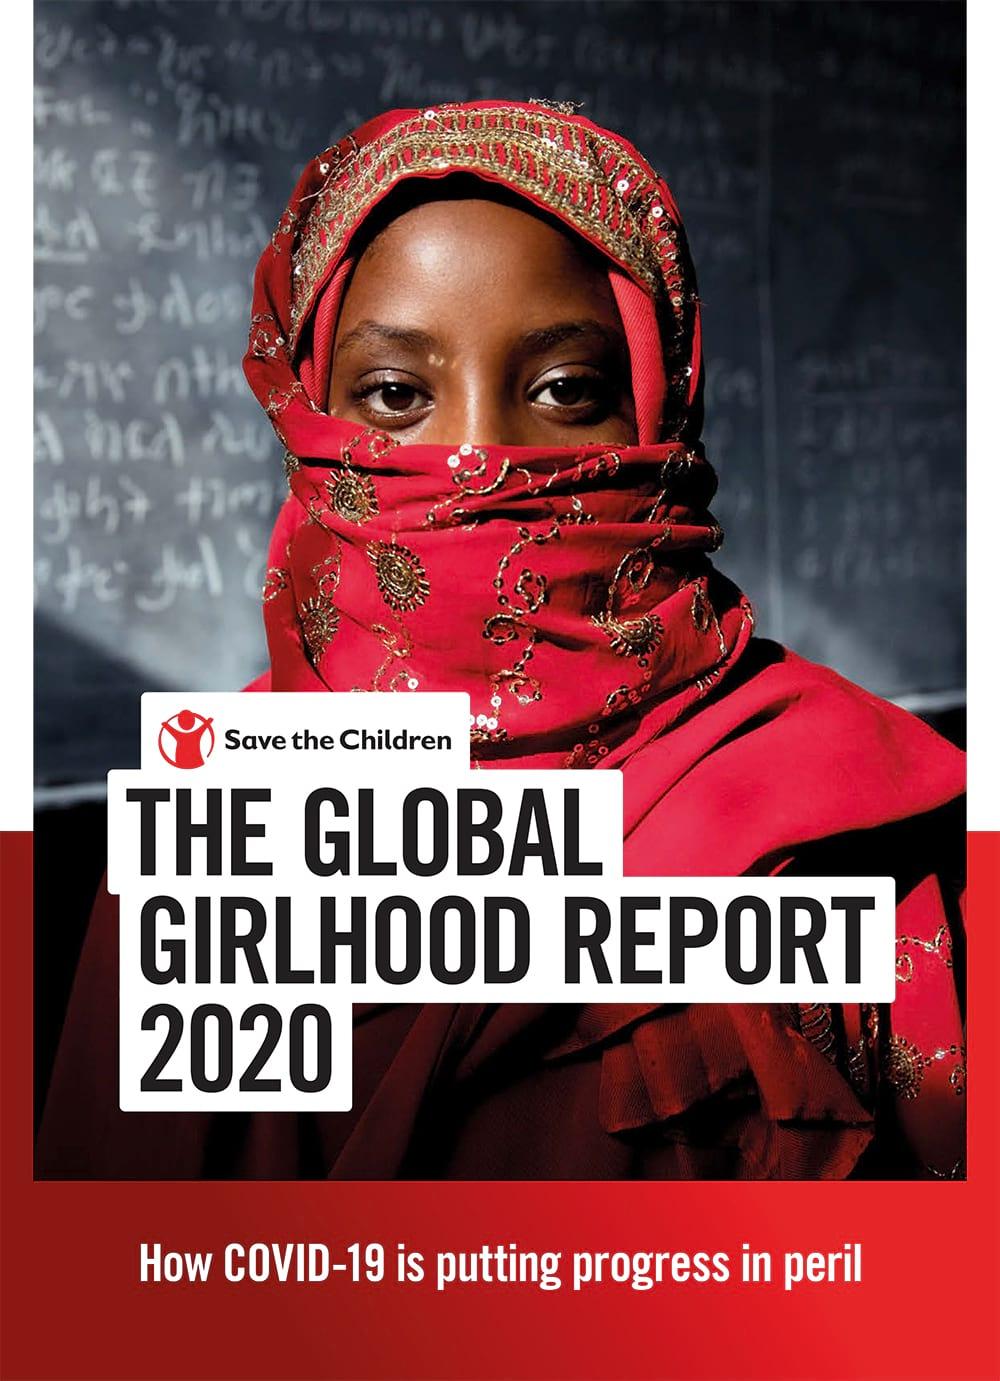 Save the Children's 2020 Global Girlhood Report